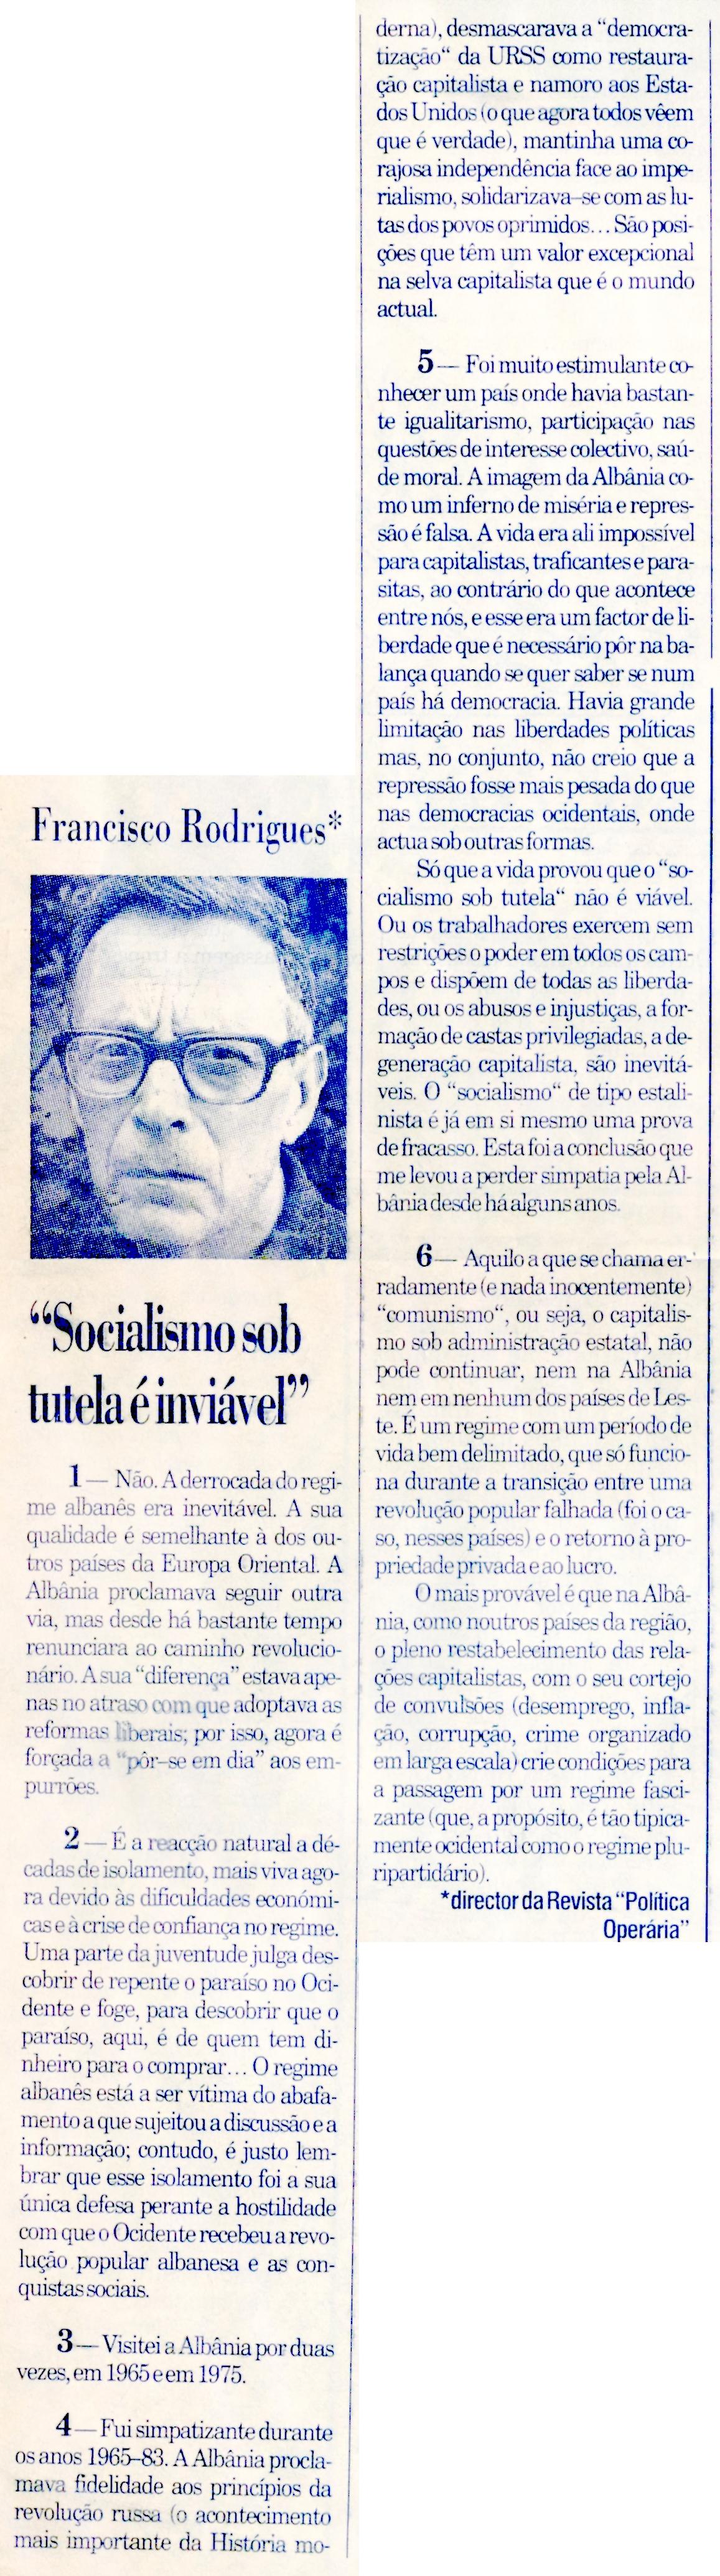 FMR Socialismosobtutela